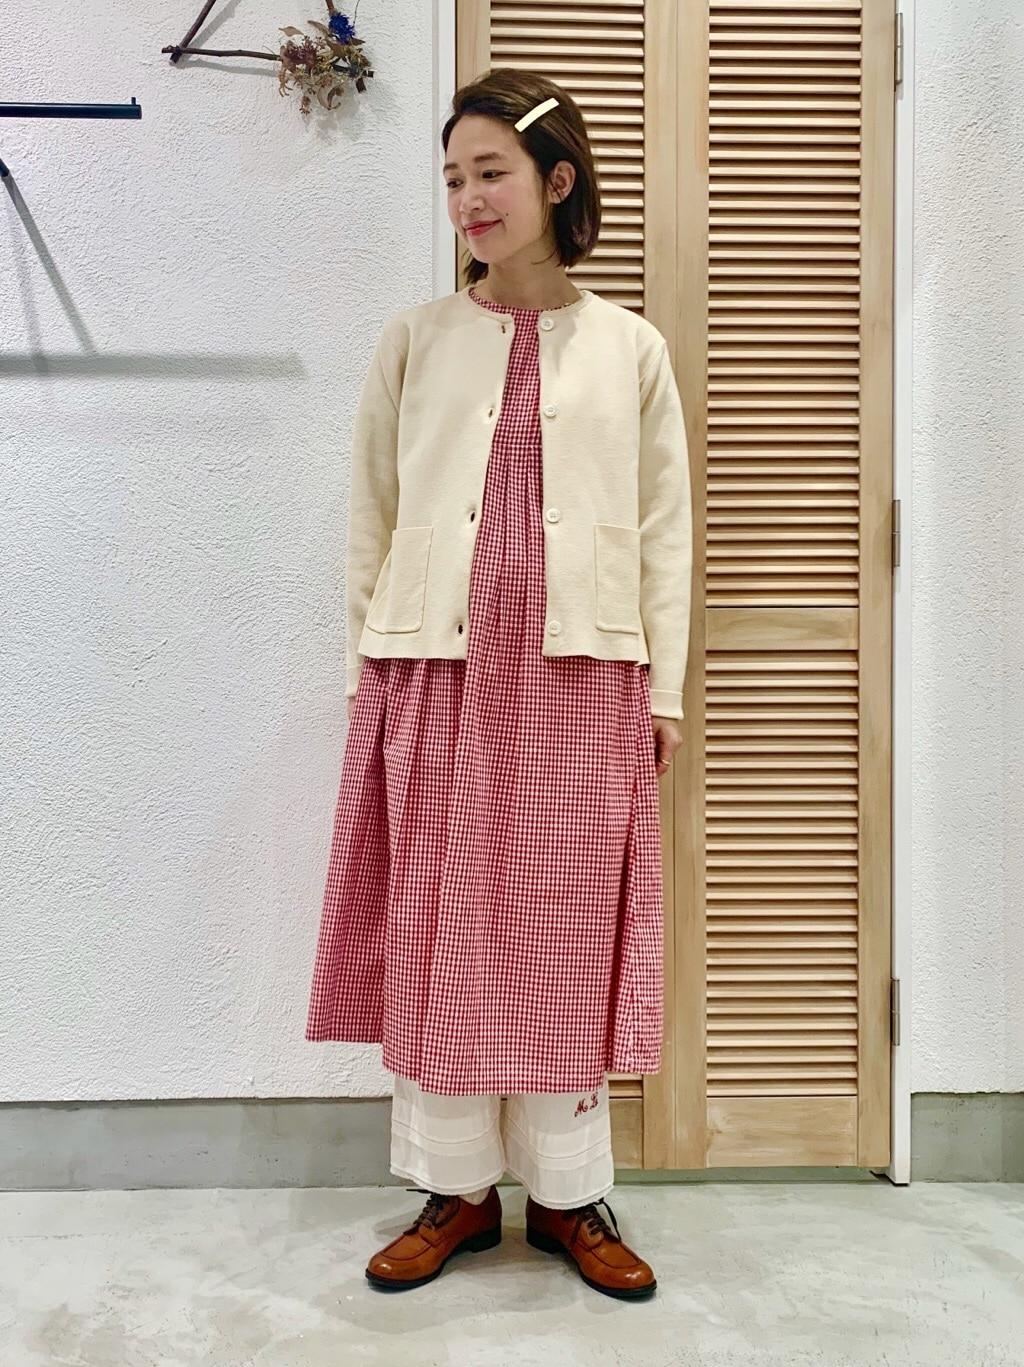 chambre de charme 横浜ジョイナス 身長:160cm 2021.02.16